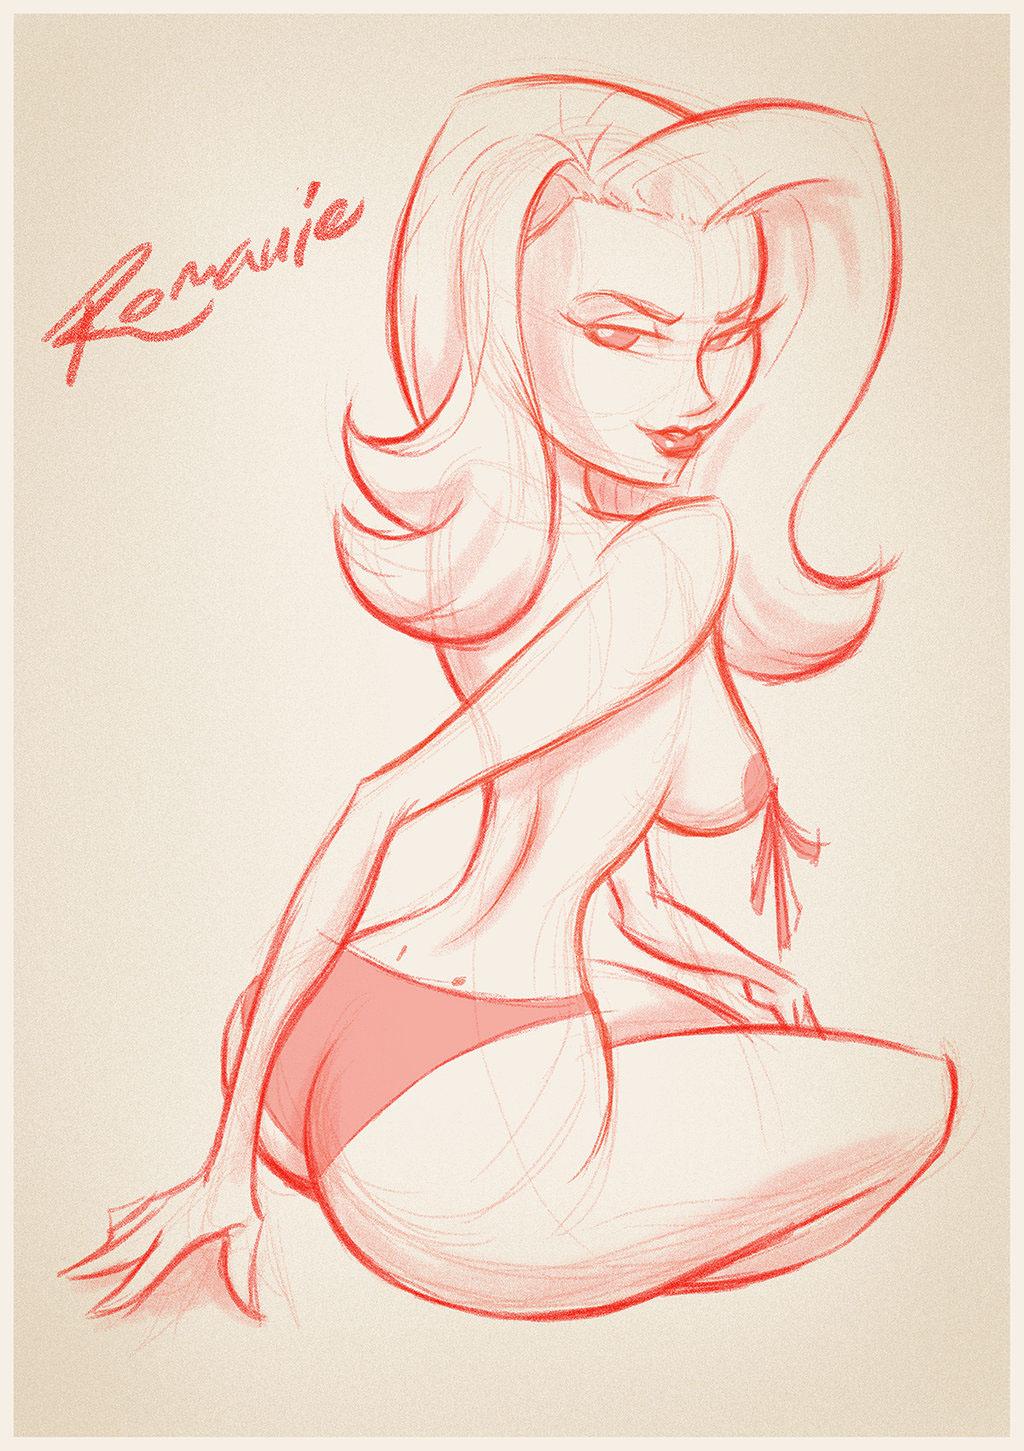 Sexy Ladies Sketches on Behance